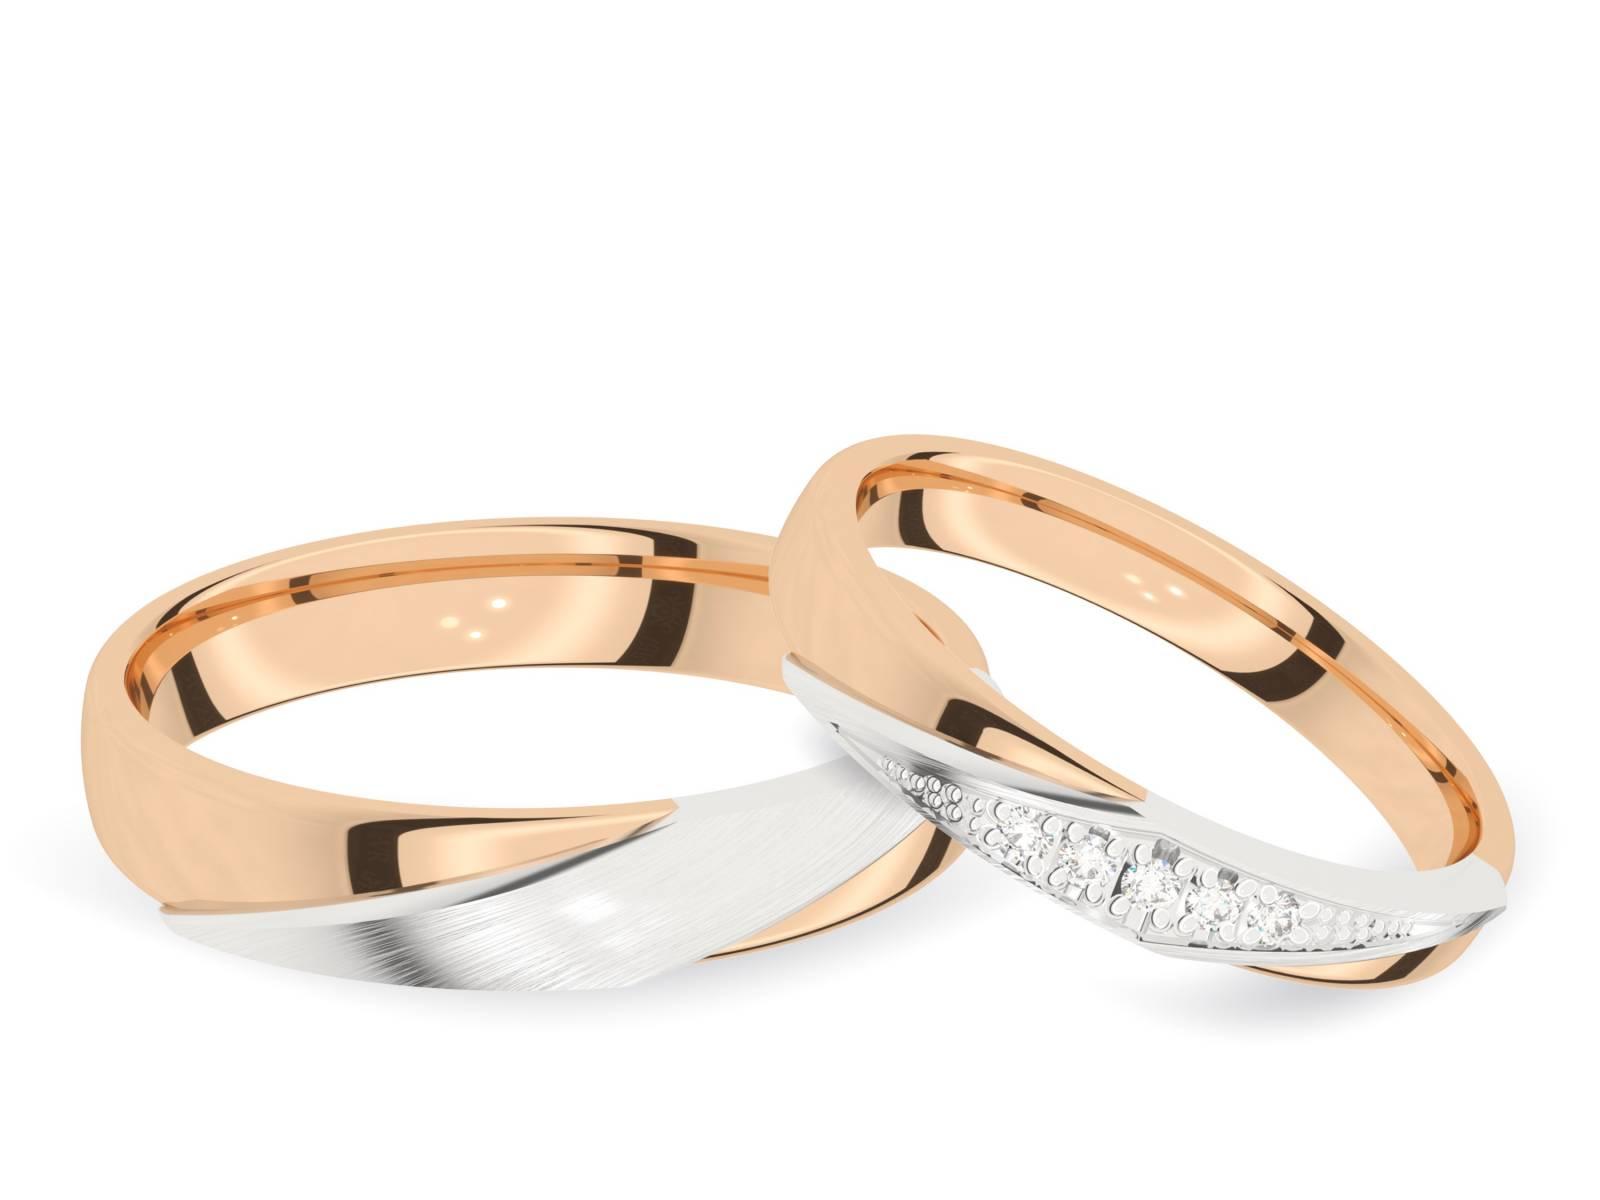 Juwelier Jan Maes - Trouwringen - Verlovingsringen - Juwelen - House of Weddings - 15